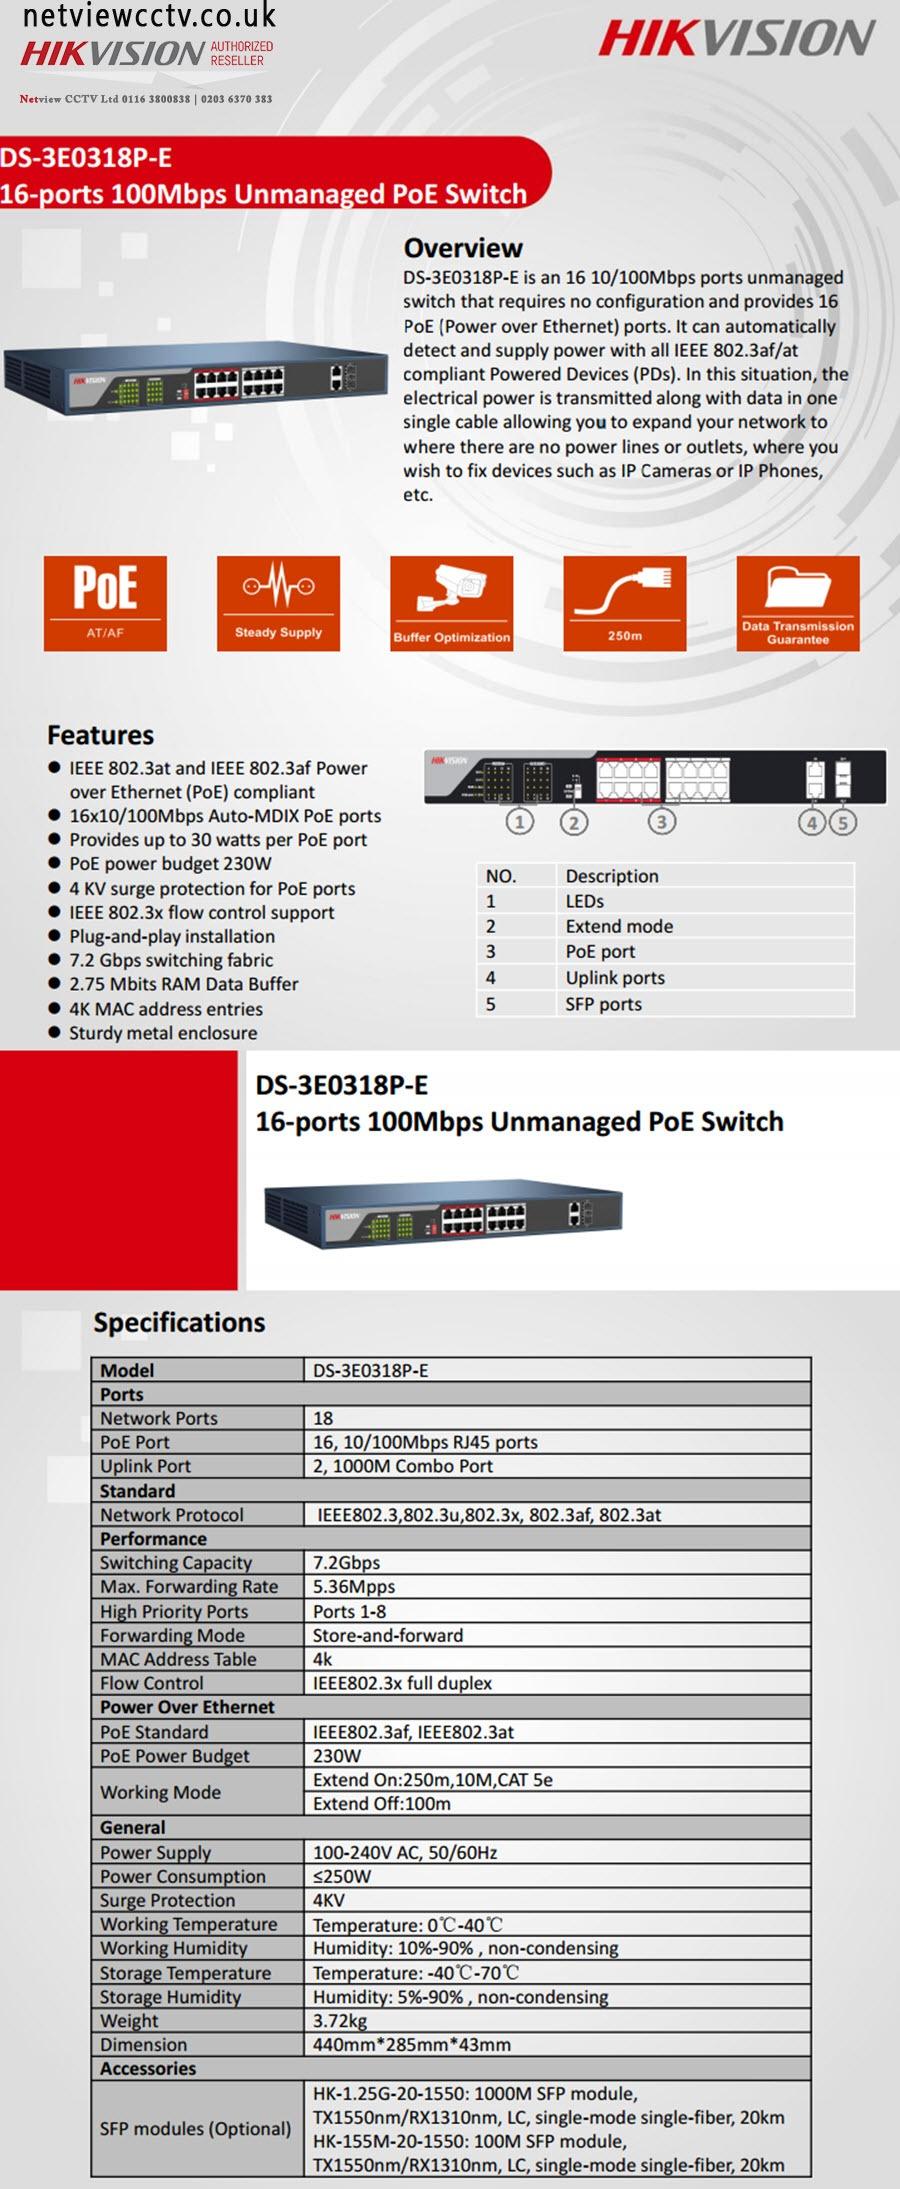 Hikvision POE Switch, DS-3E0318P-E datasheet